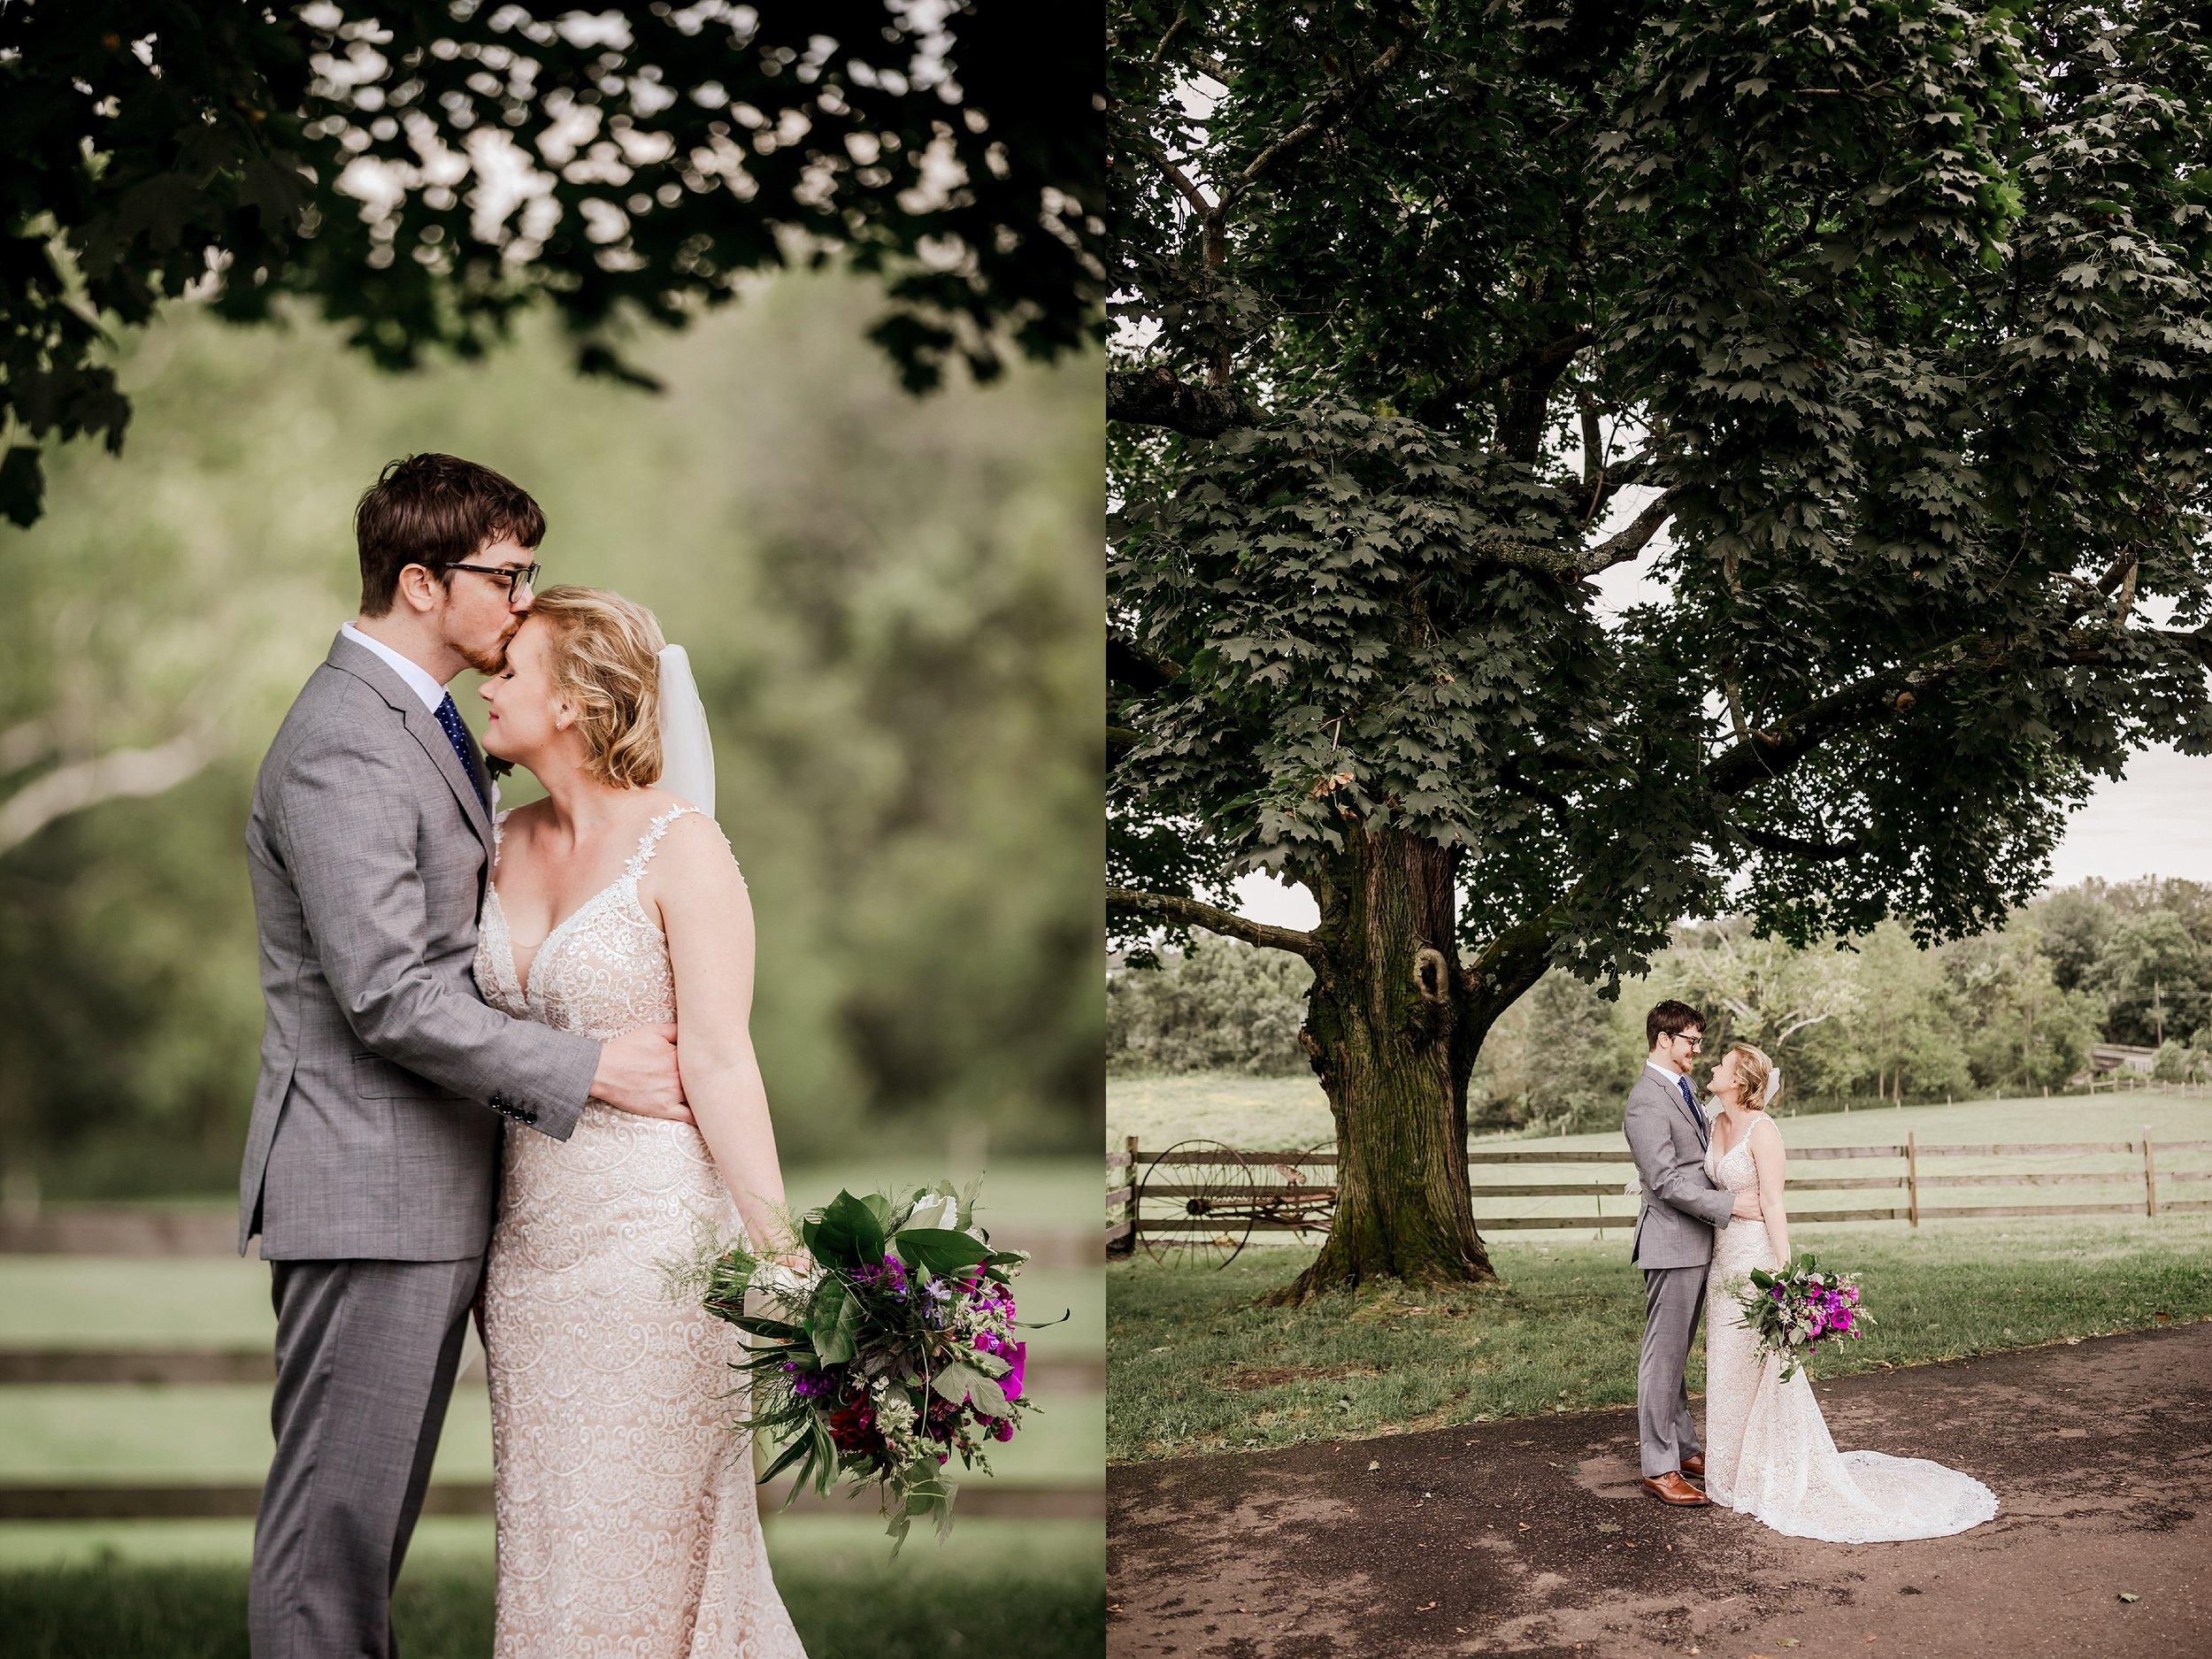 Durham-Hill-Farm-Wedding-Photographer_0050.jpg